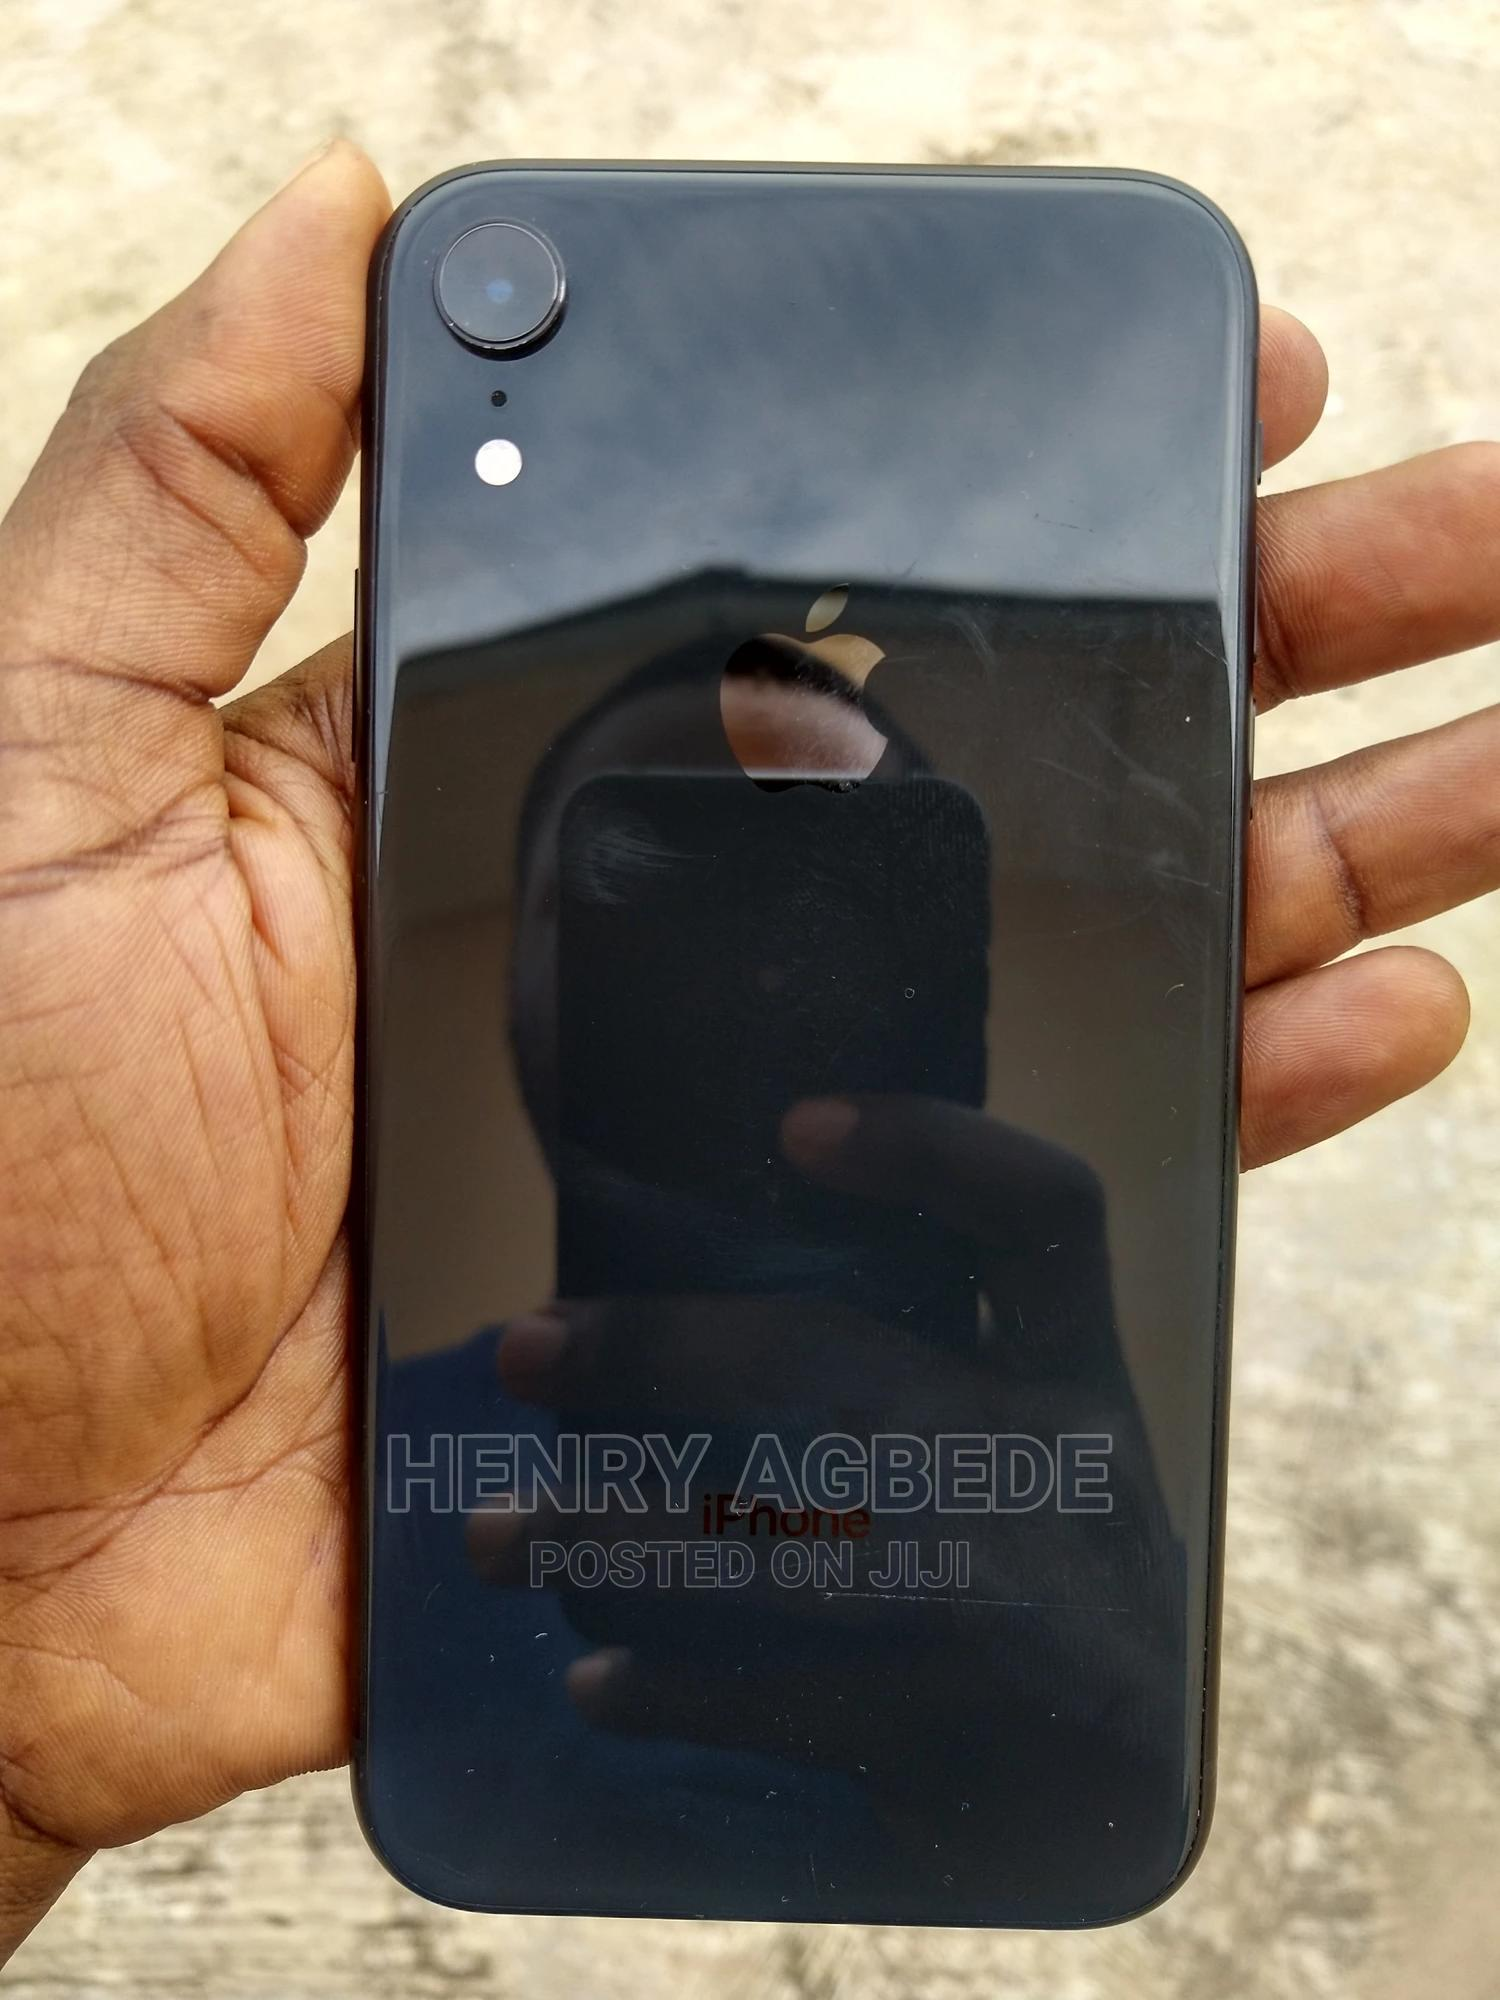 Apple iPhone XR 64 GB Black | Mobile Phones for sale in Akure, Ondo State, Nigeria